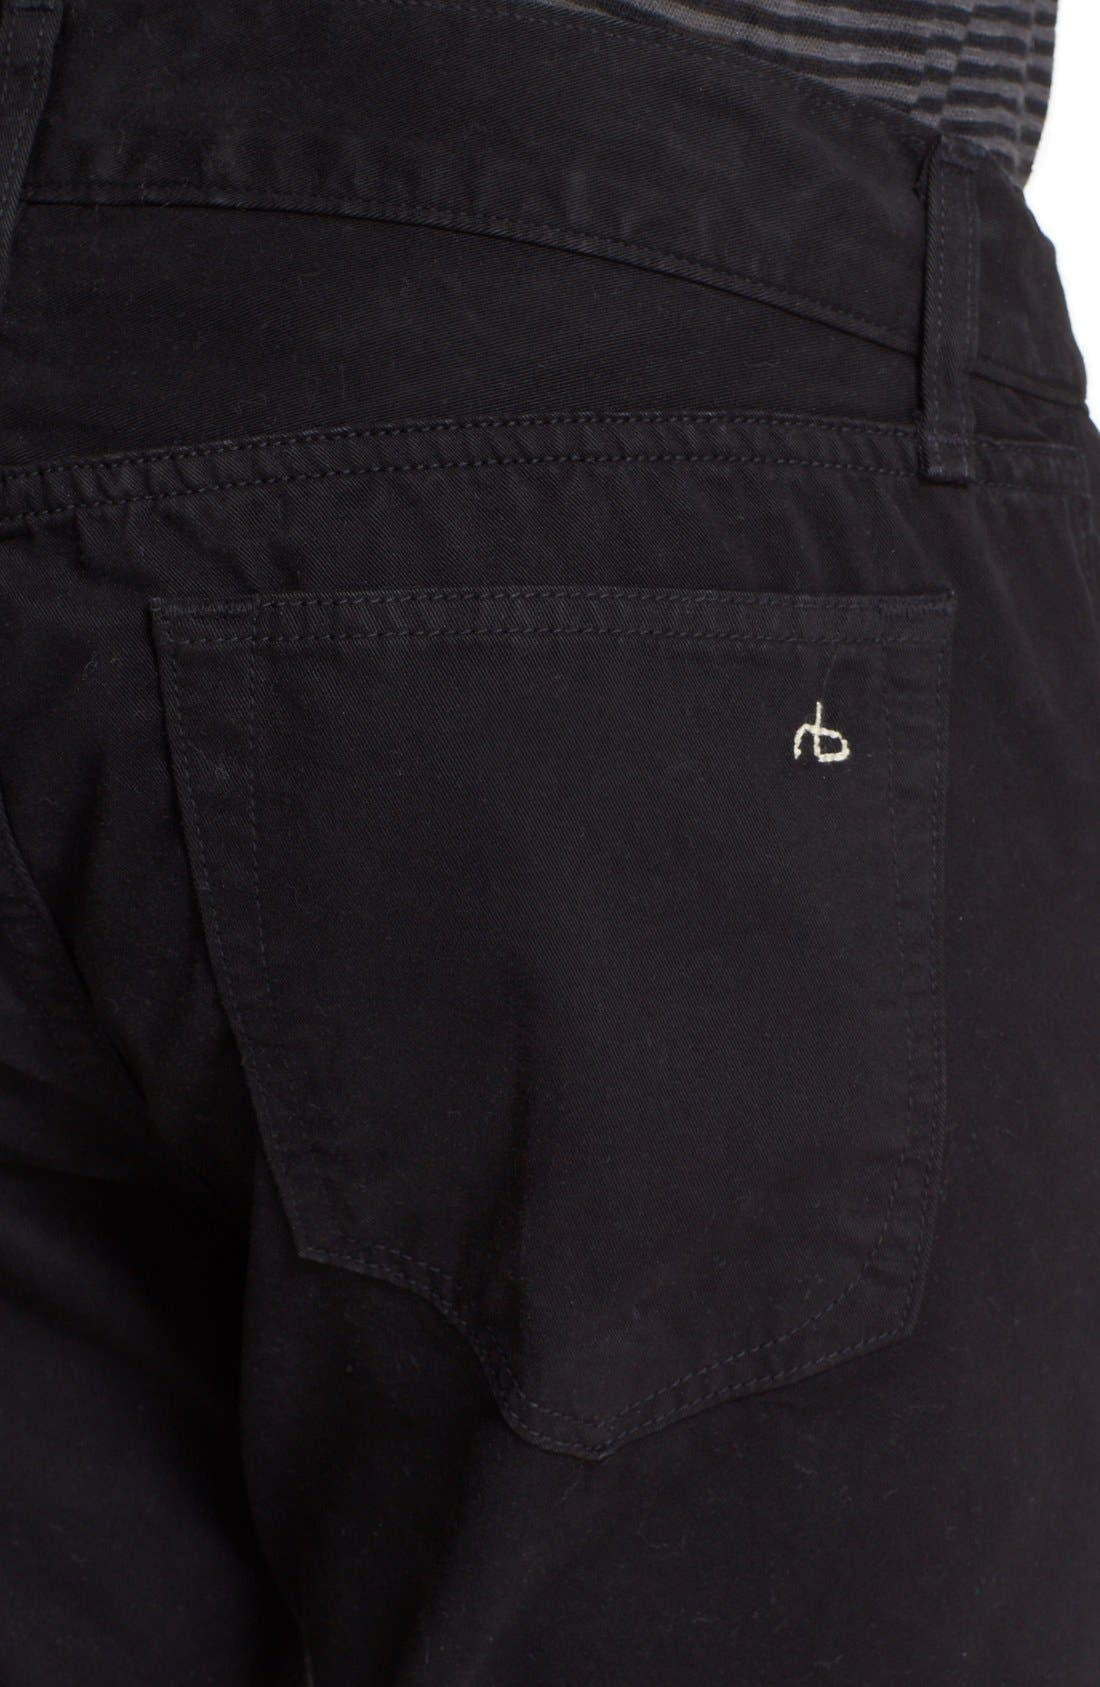 Alternate Image 4  - rag & bone 'Fit 2' Cotton Twill Pants (Nordstrom Exclusive)